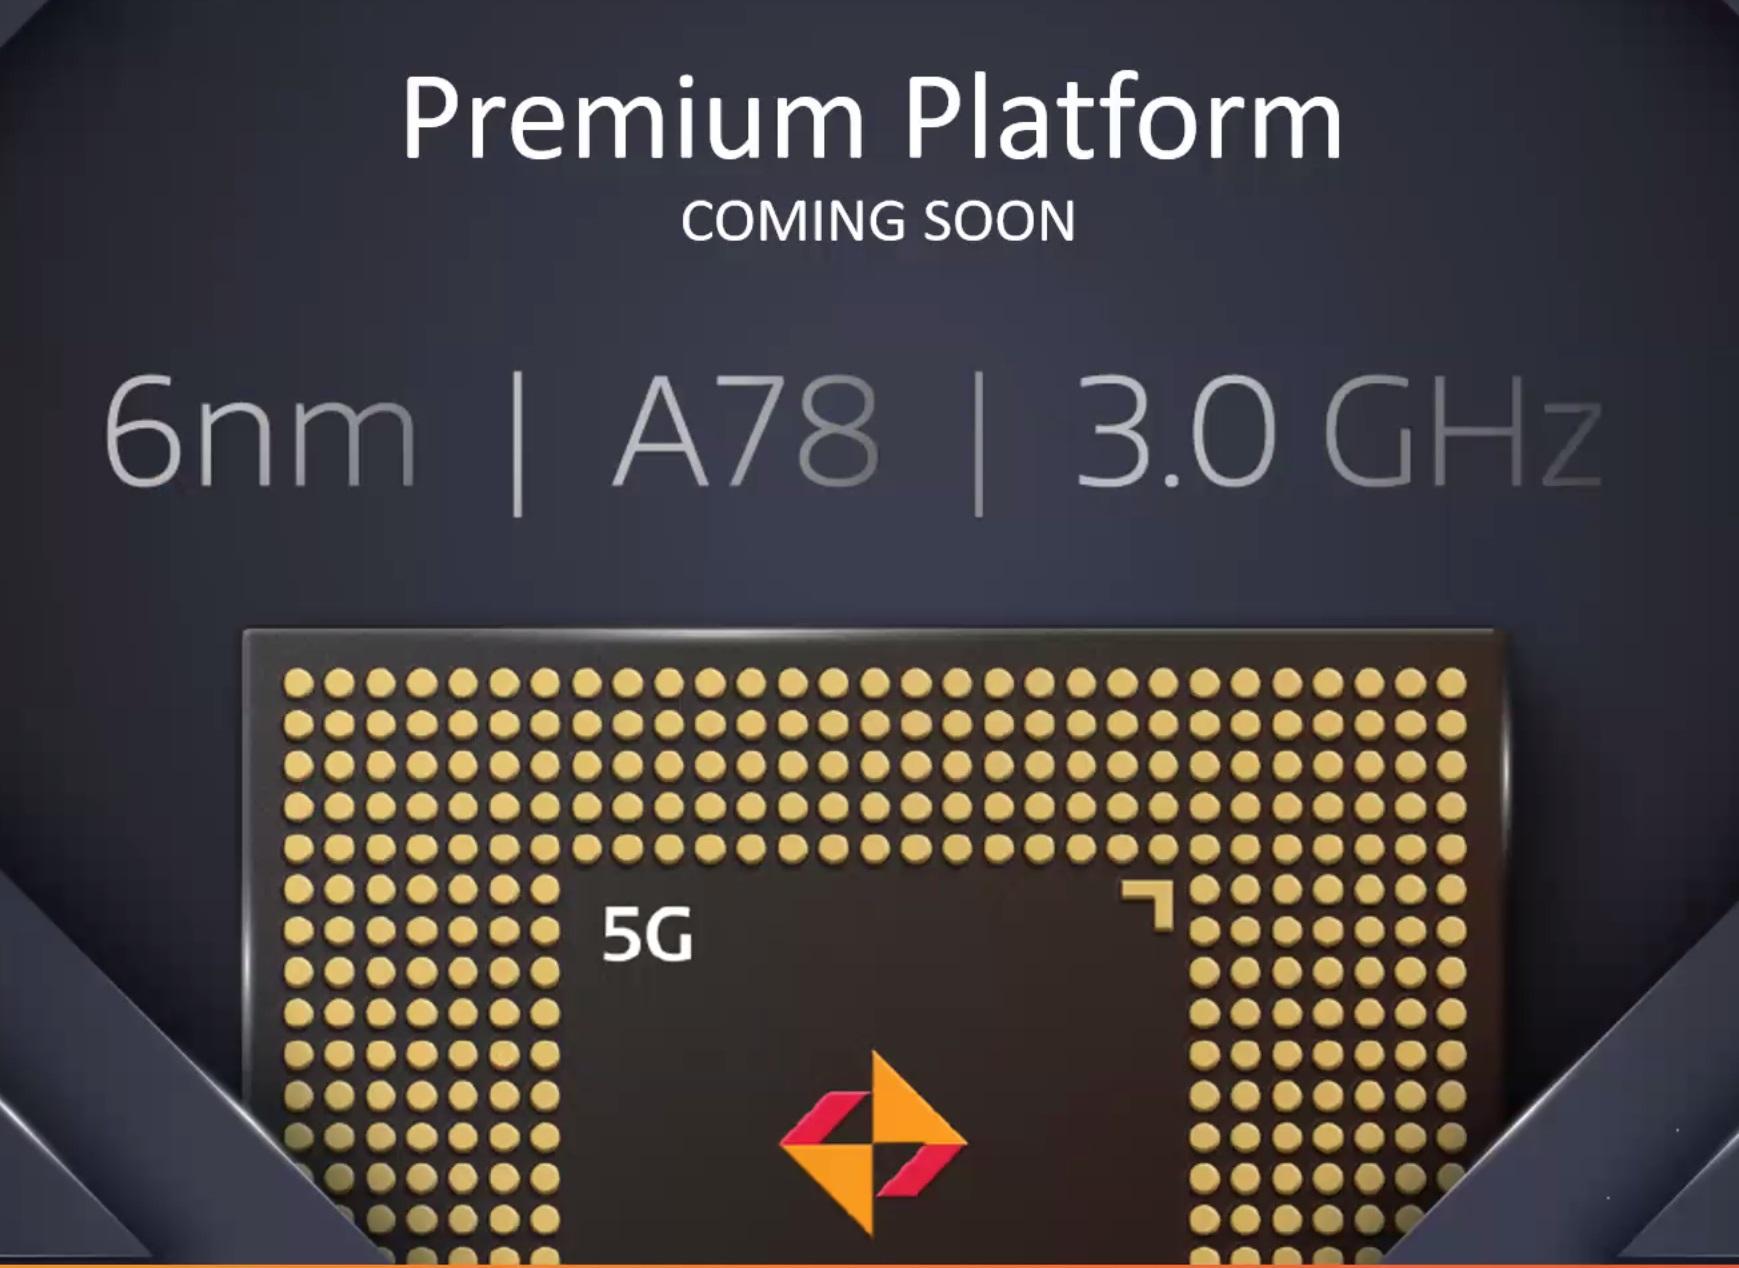 procesor MediaTek 6 nm ARM Cortex-A78 3 GHz